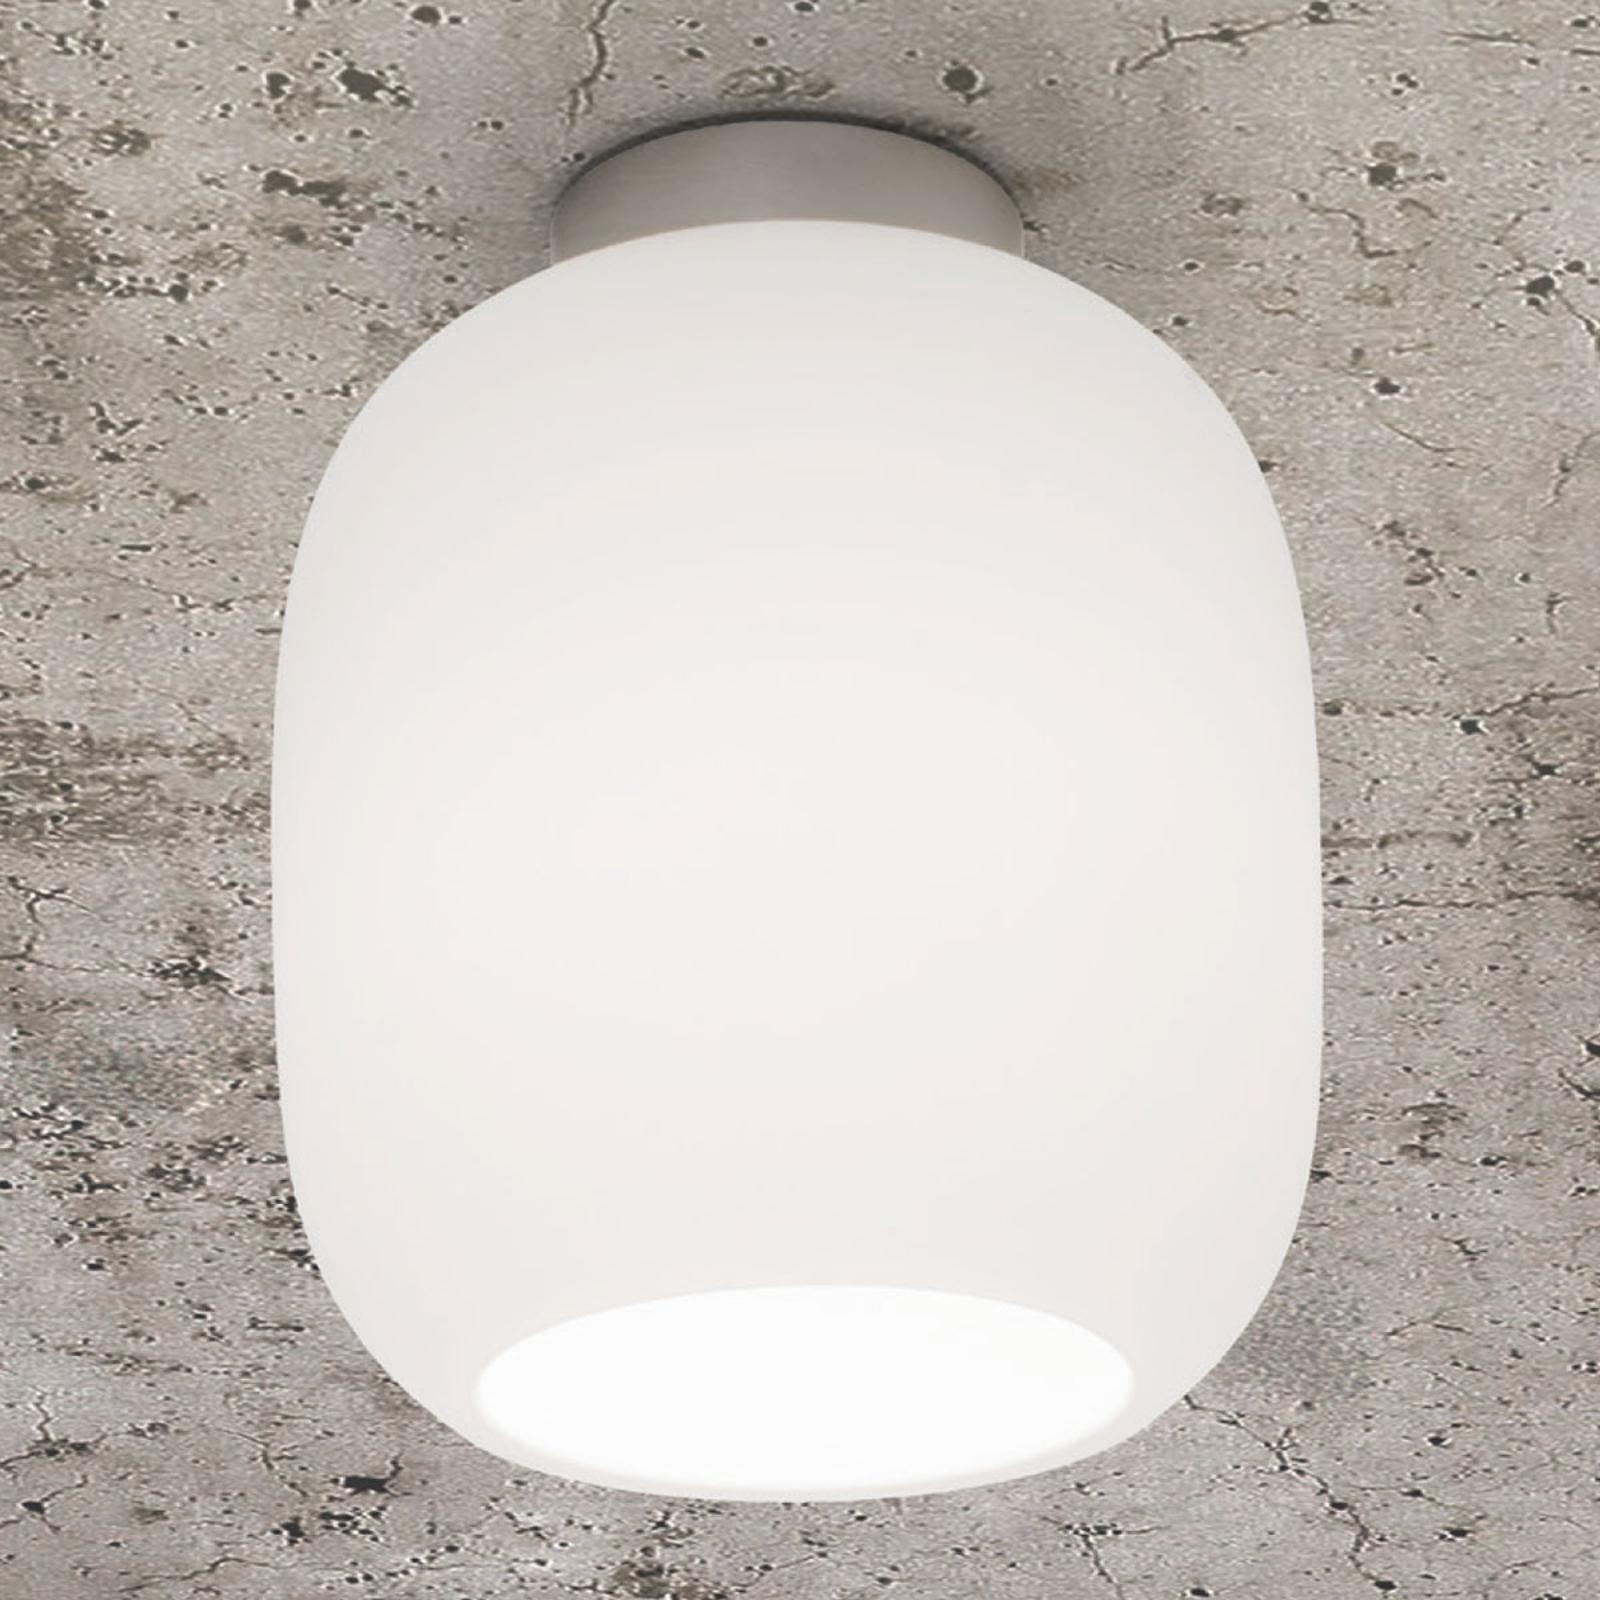 Casablanca Murea plafondlamp, opaalwit, Ø 13 cm